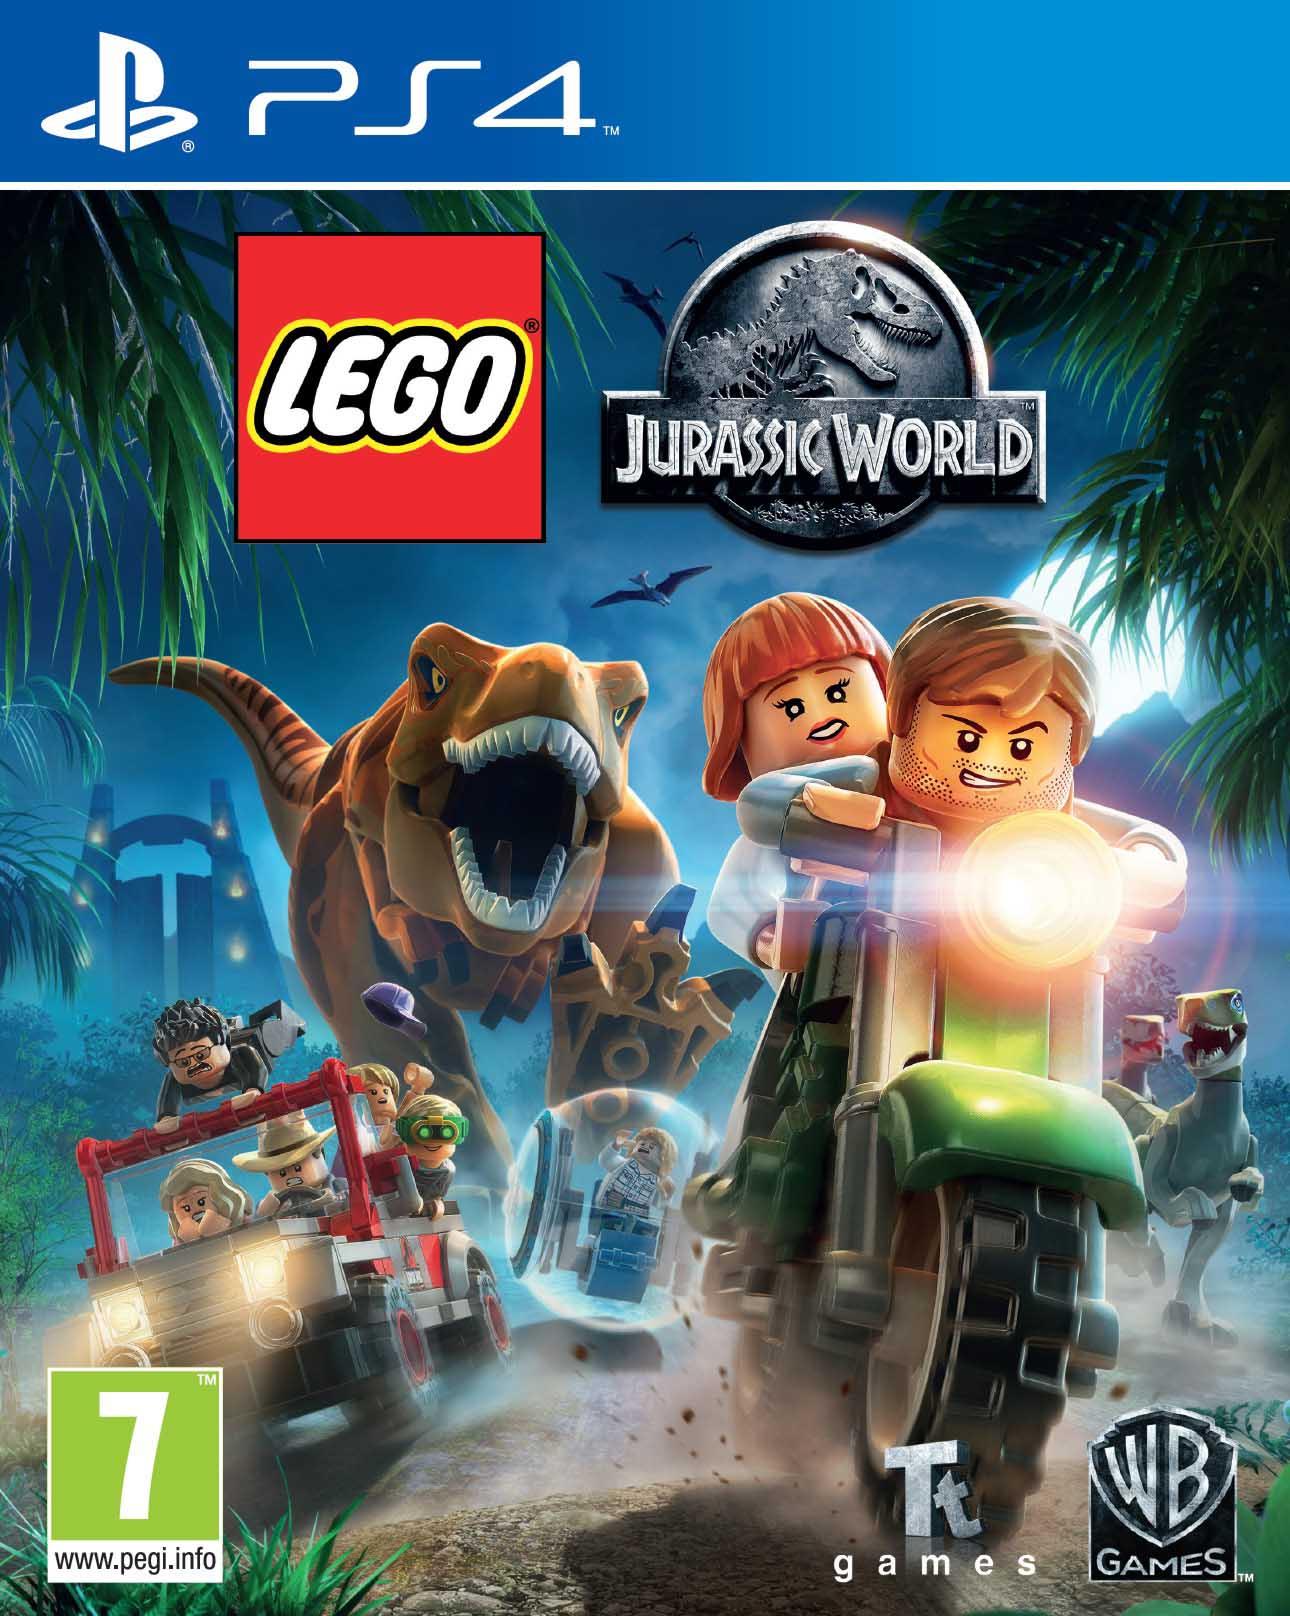 LEGO JURASSIC WORLD GAME - PS4